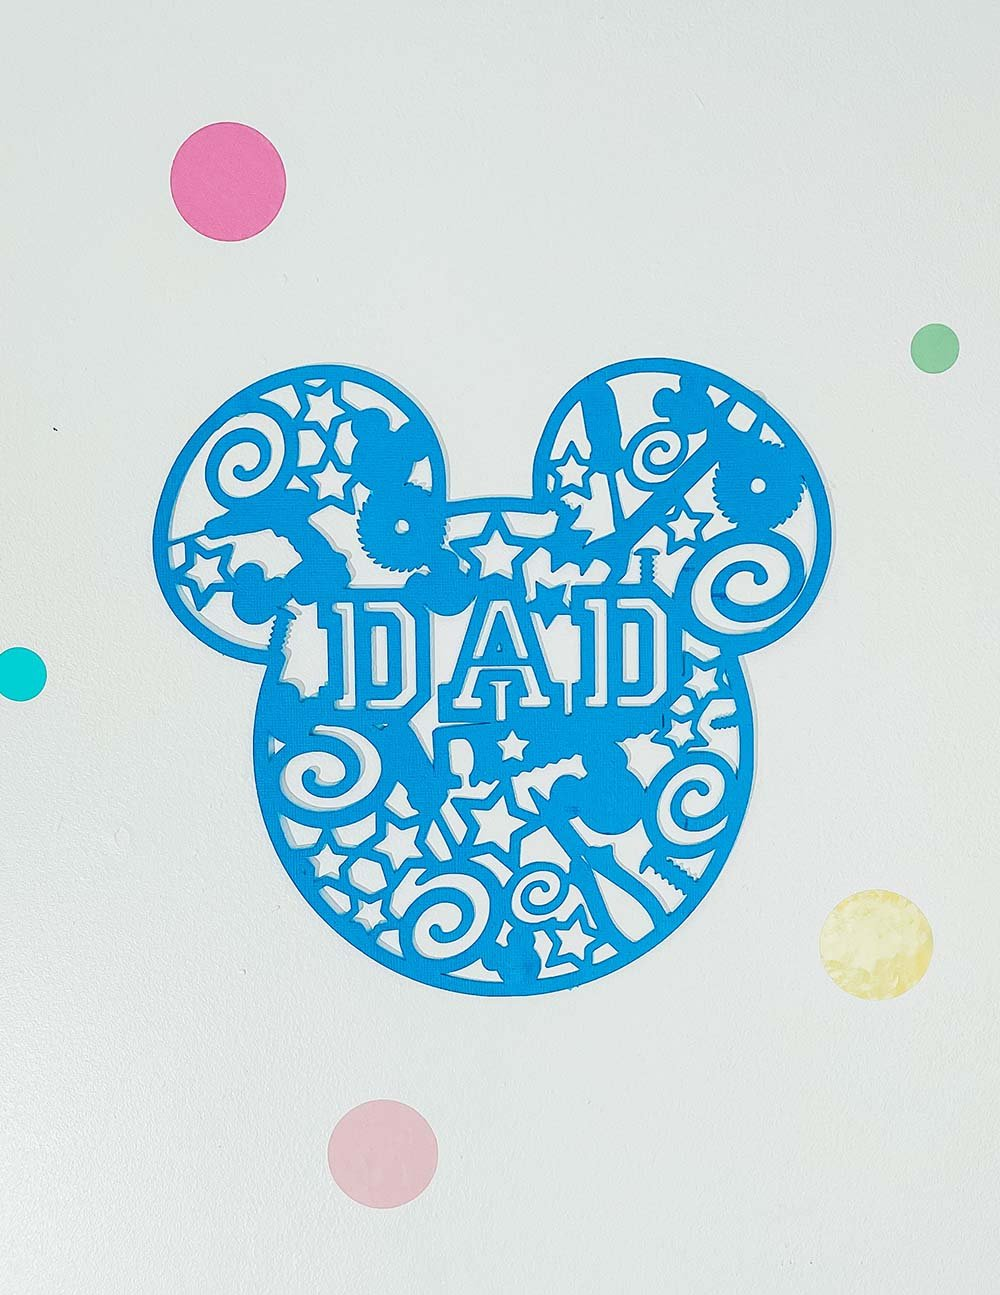 Disney Fathers Day SVG